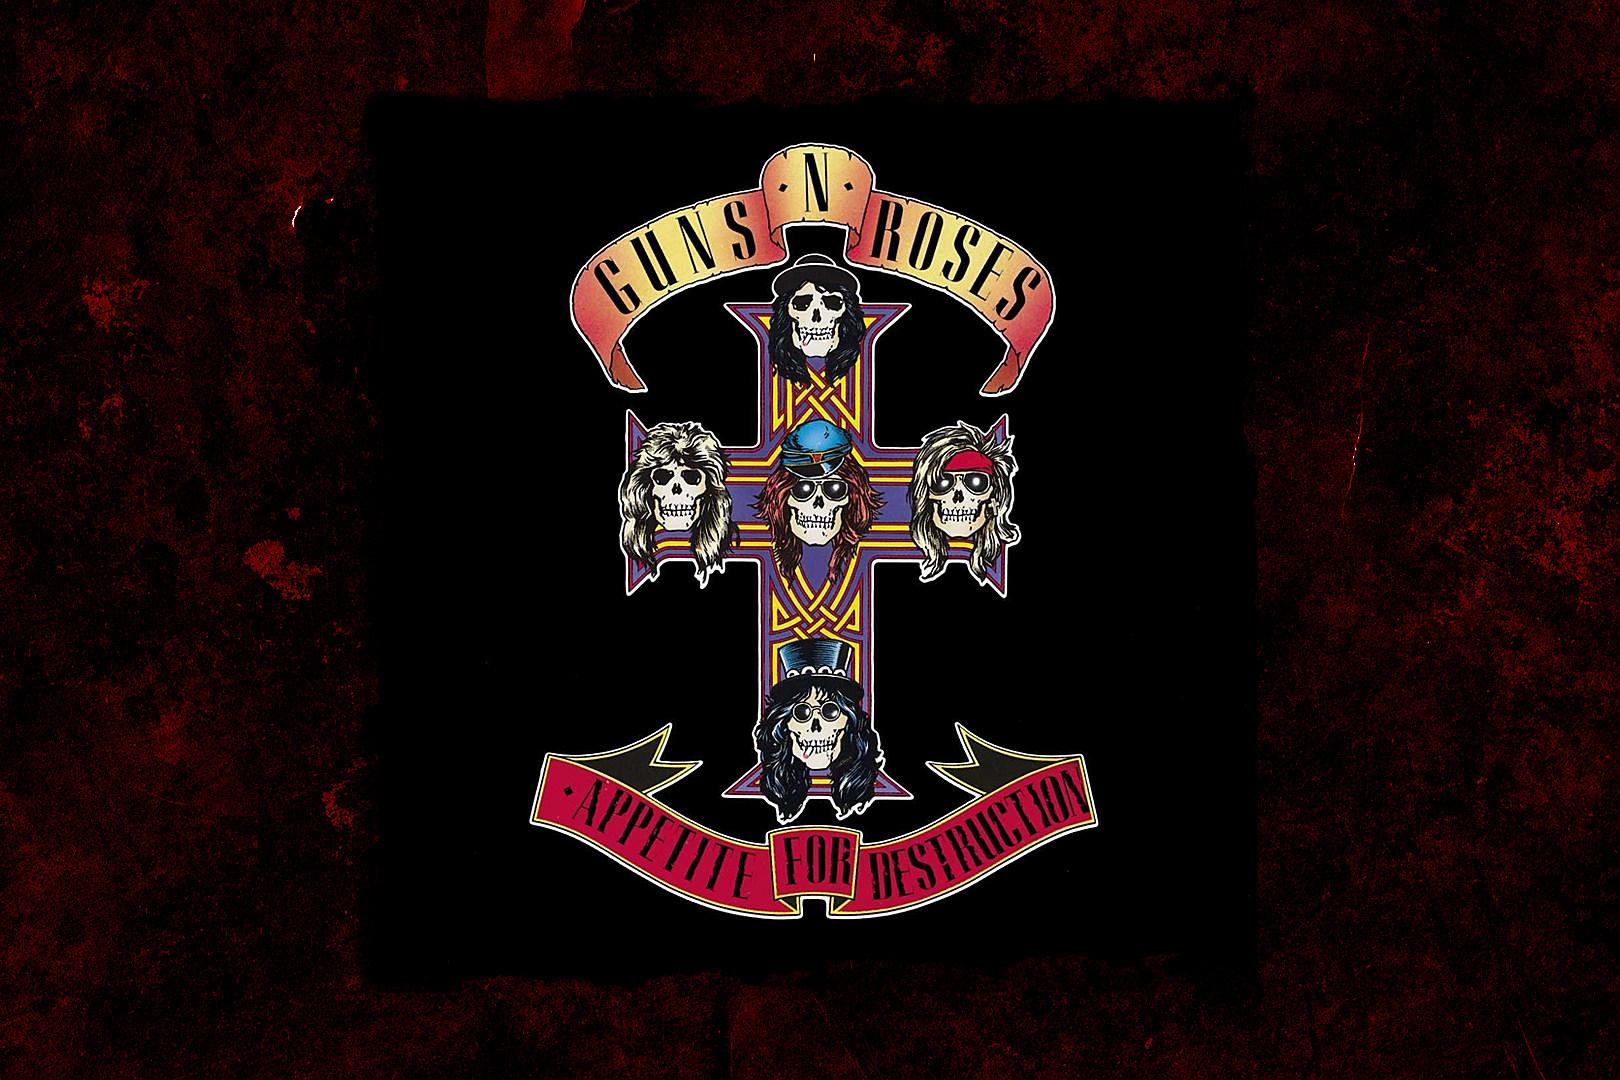 32 Years Ago: Guns N' Roses Release 'Appetite for Destruction'